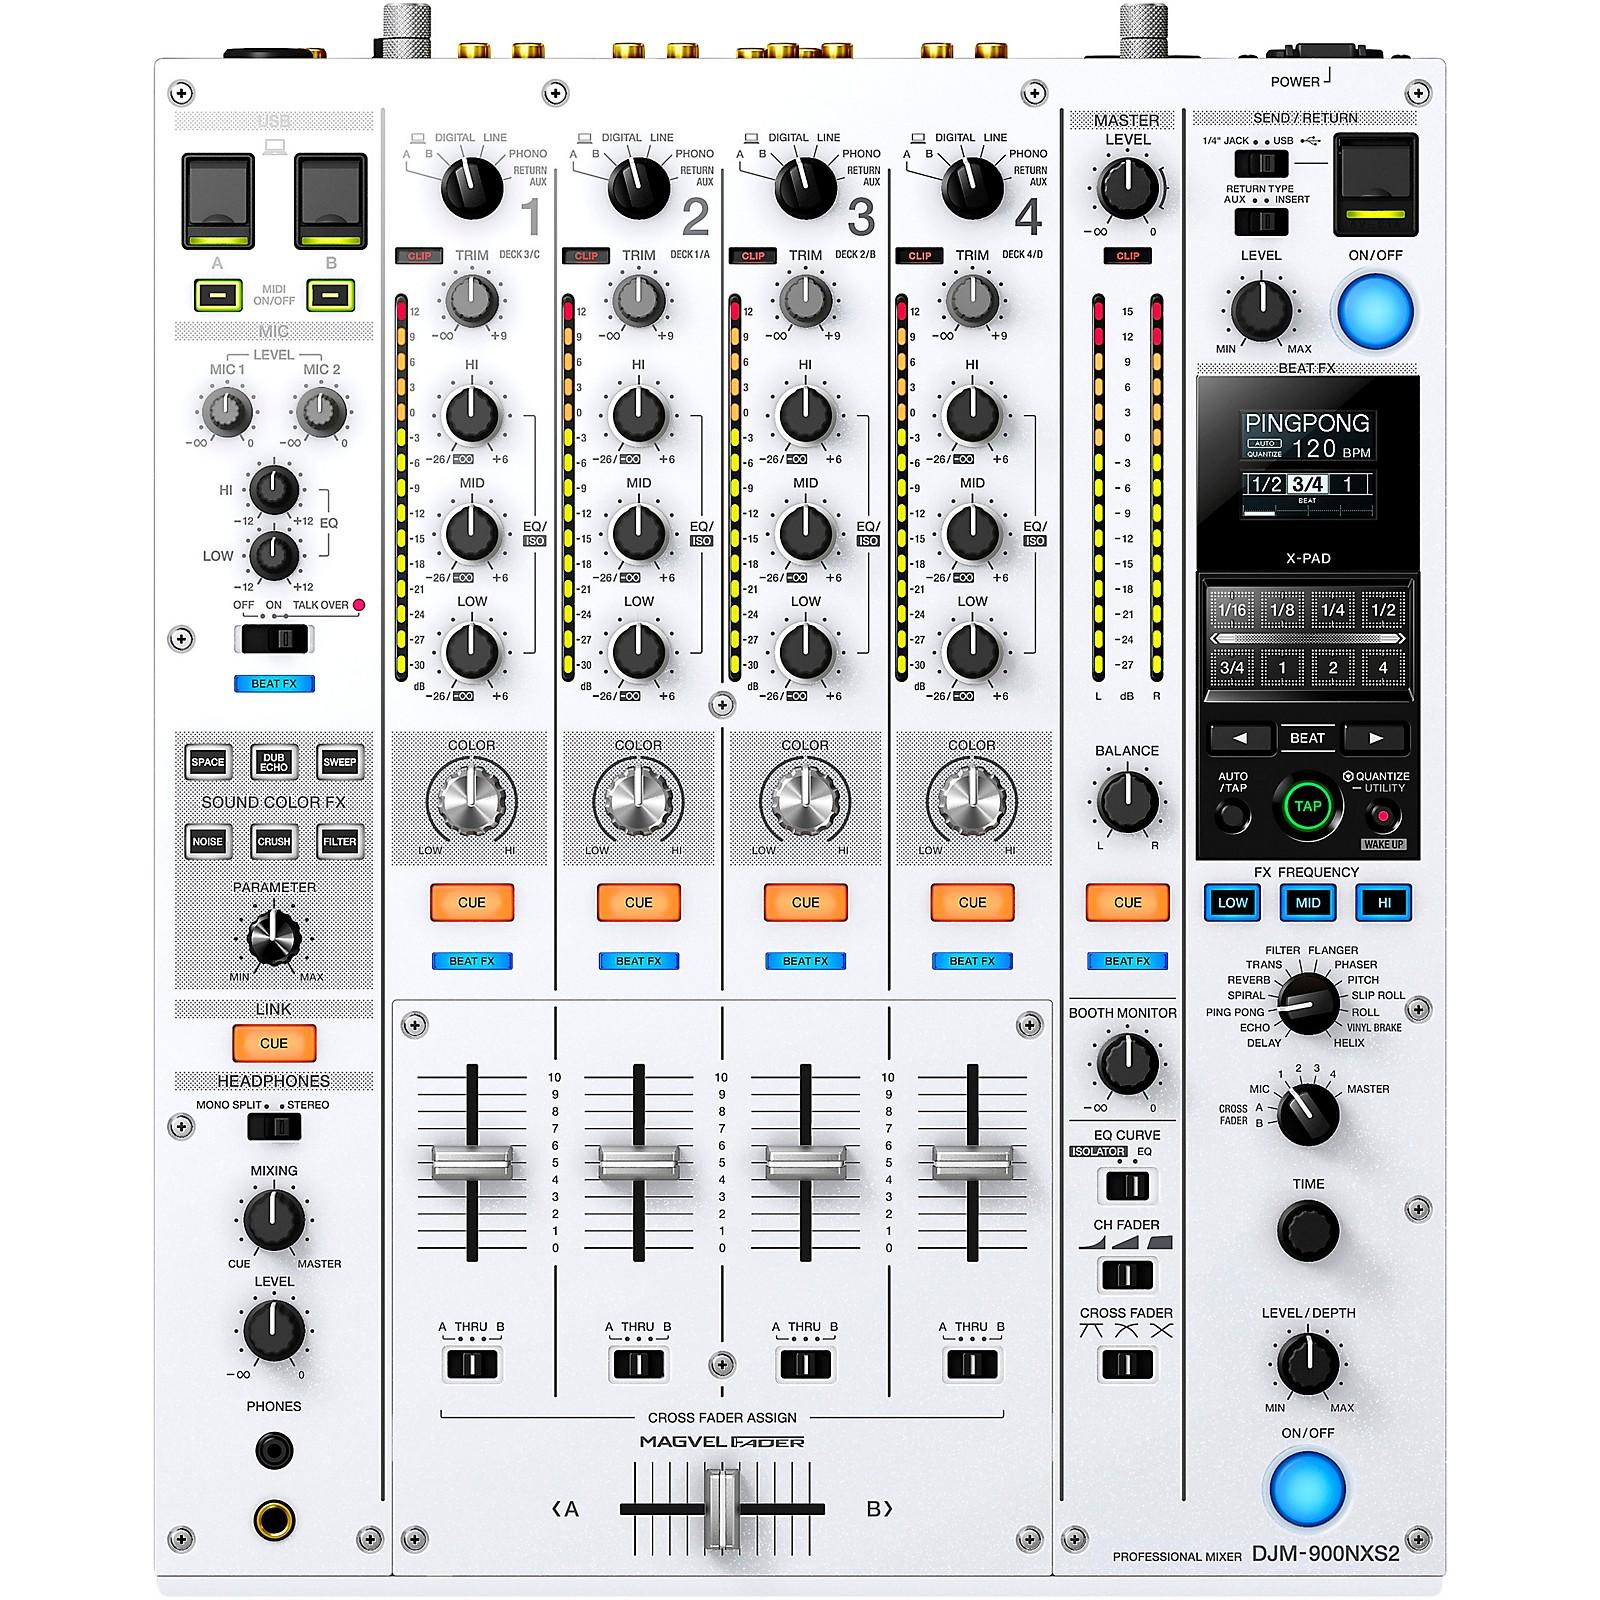 Pioneer DJM-900NXS2-W Limited Edition White Professional 4-Channel Digital DJ Mixer With Dual USB for Serato, TRAKTOR and rekordbox